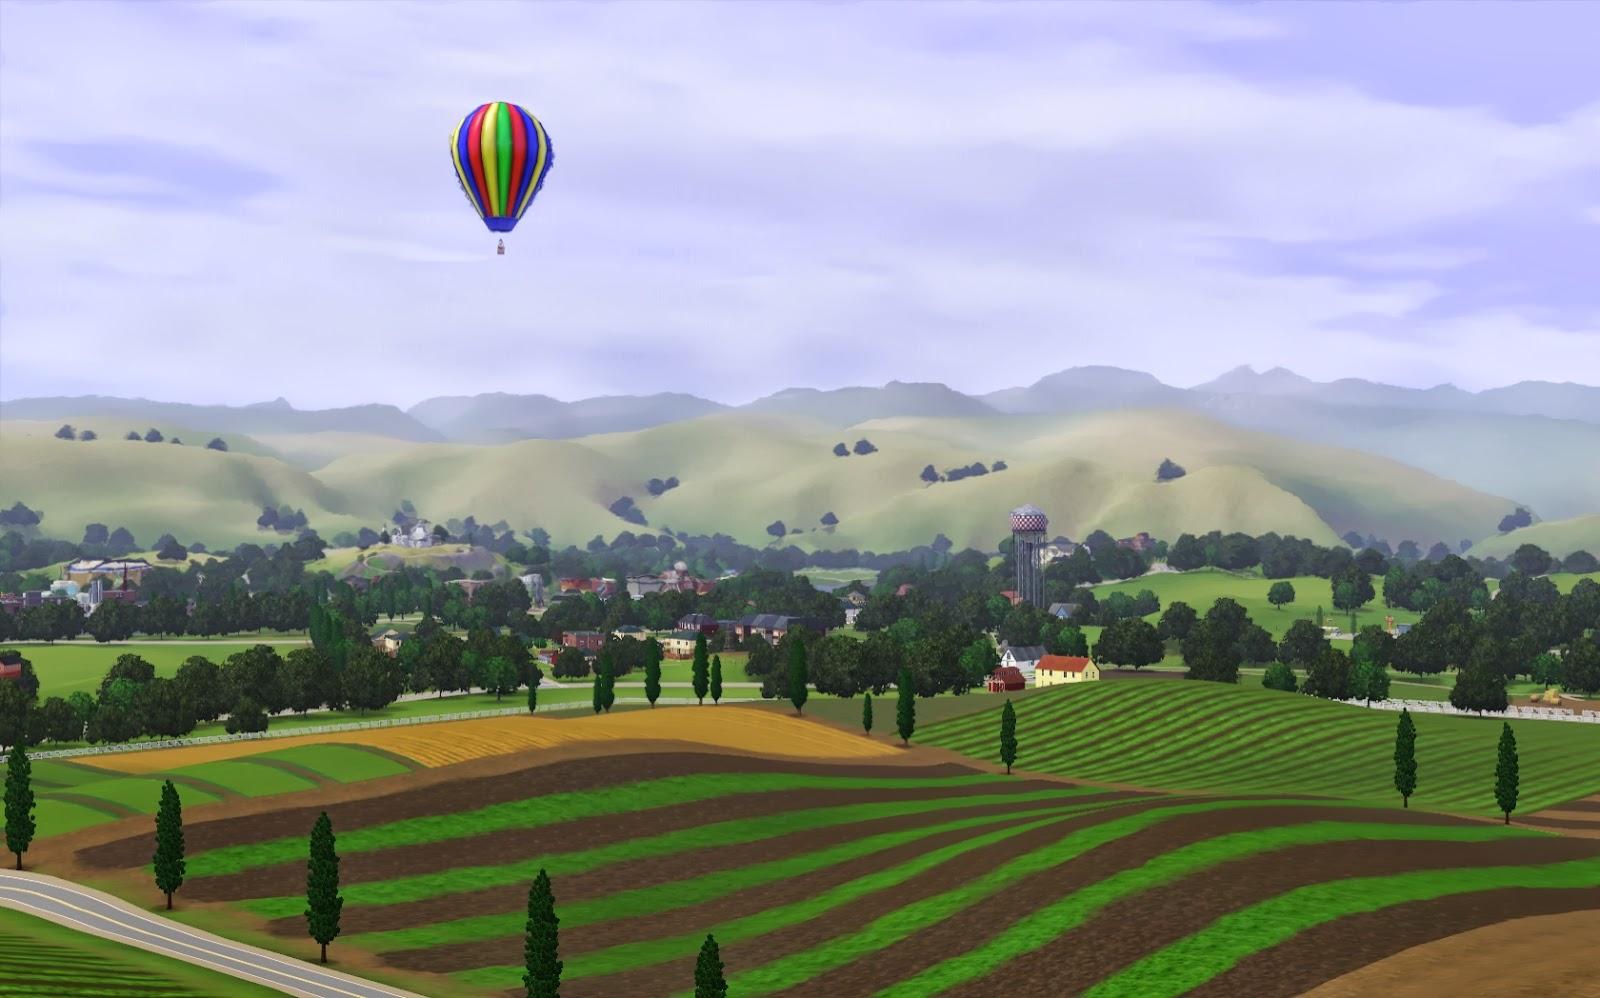 Summer's Little Sims 3 Garden: Riverview List of Houses